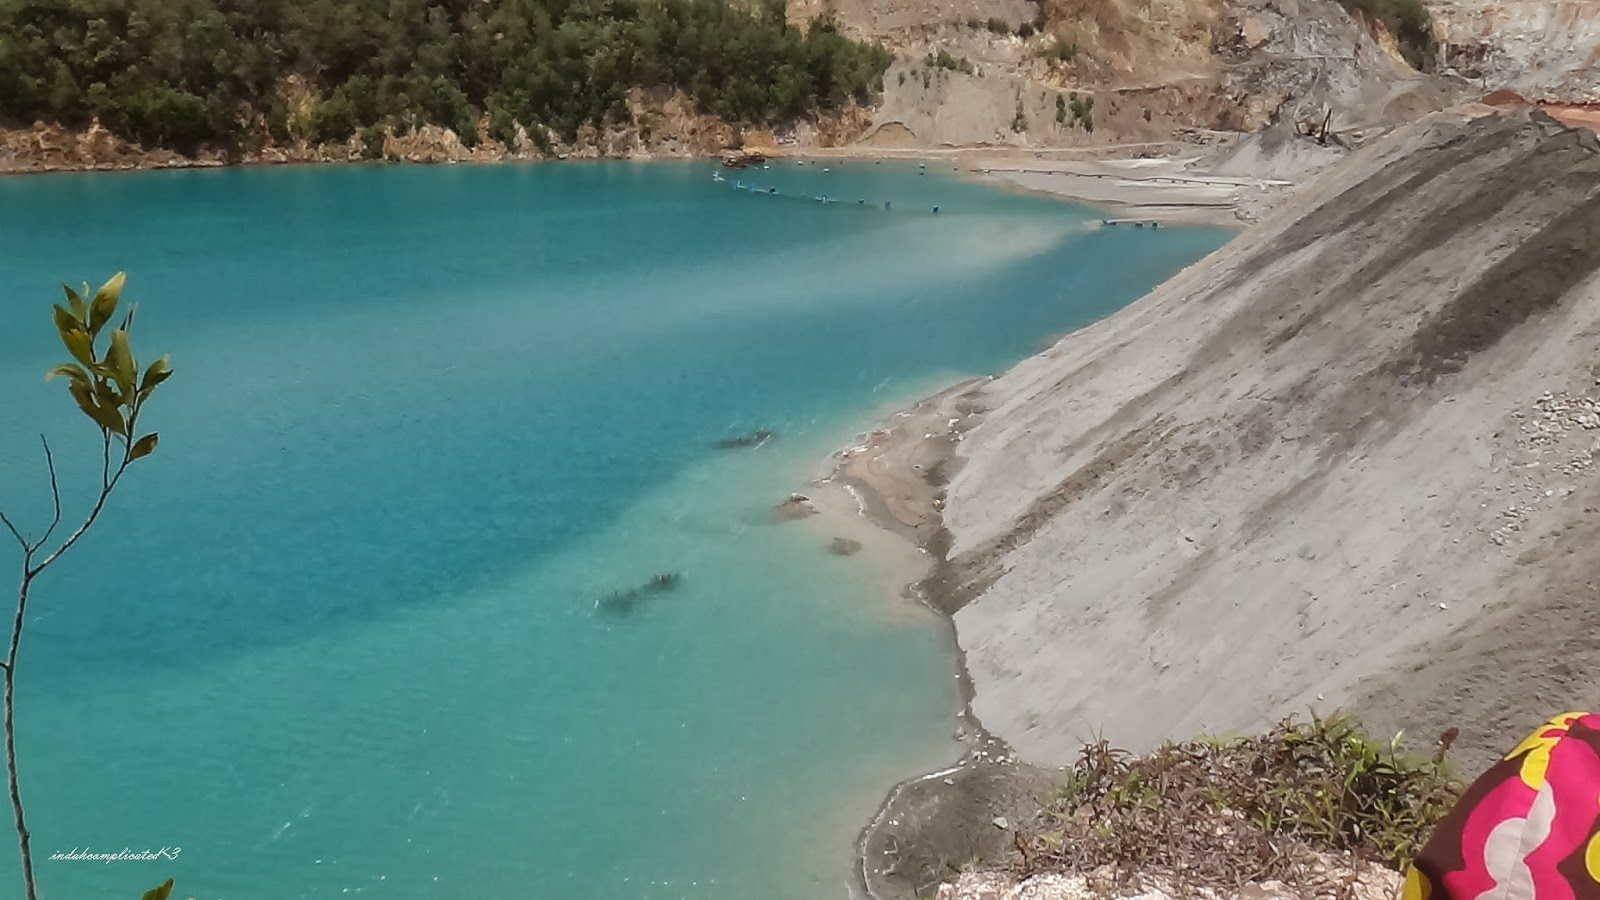 Blue Lake of Bukit Ibam Muadzam Shah Pahang